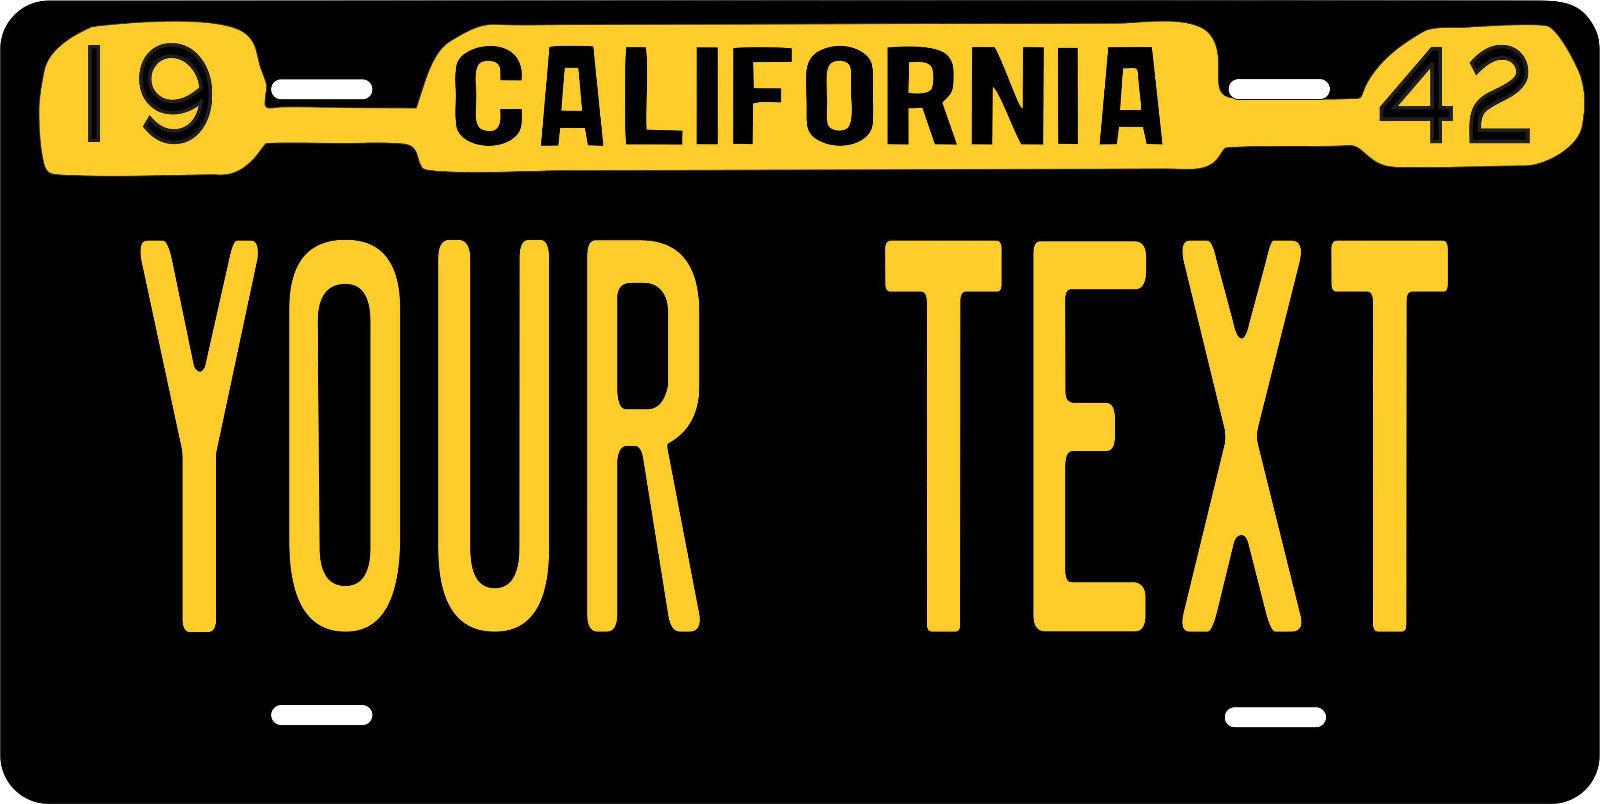 10.7 California 1942 License Plate Personalized Custom